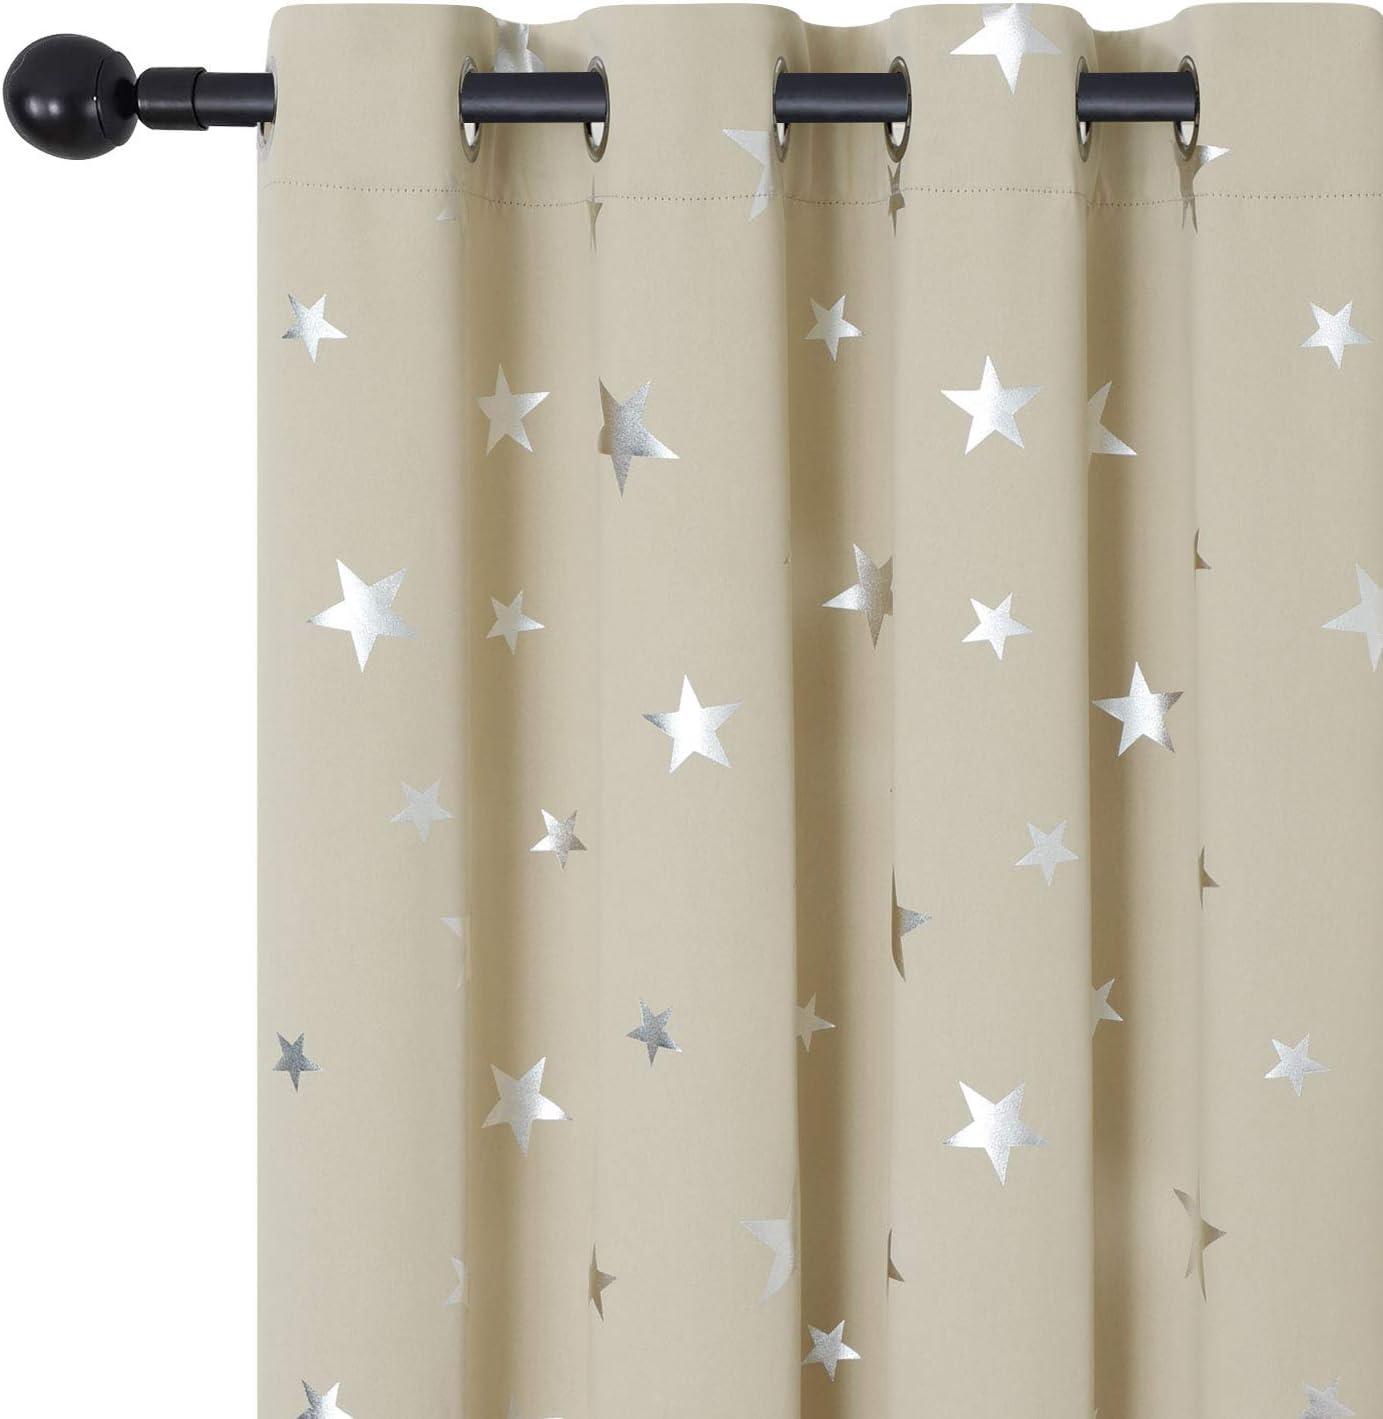 Estelar Textiler Inexpensive Cheap Star Print Drapes Geometric Gro for Living Room